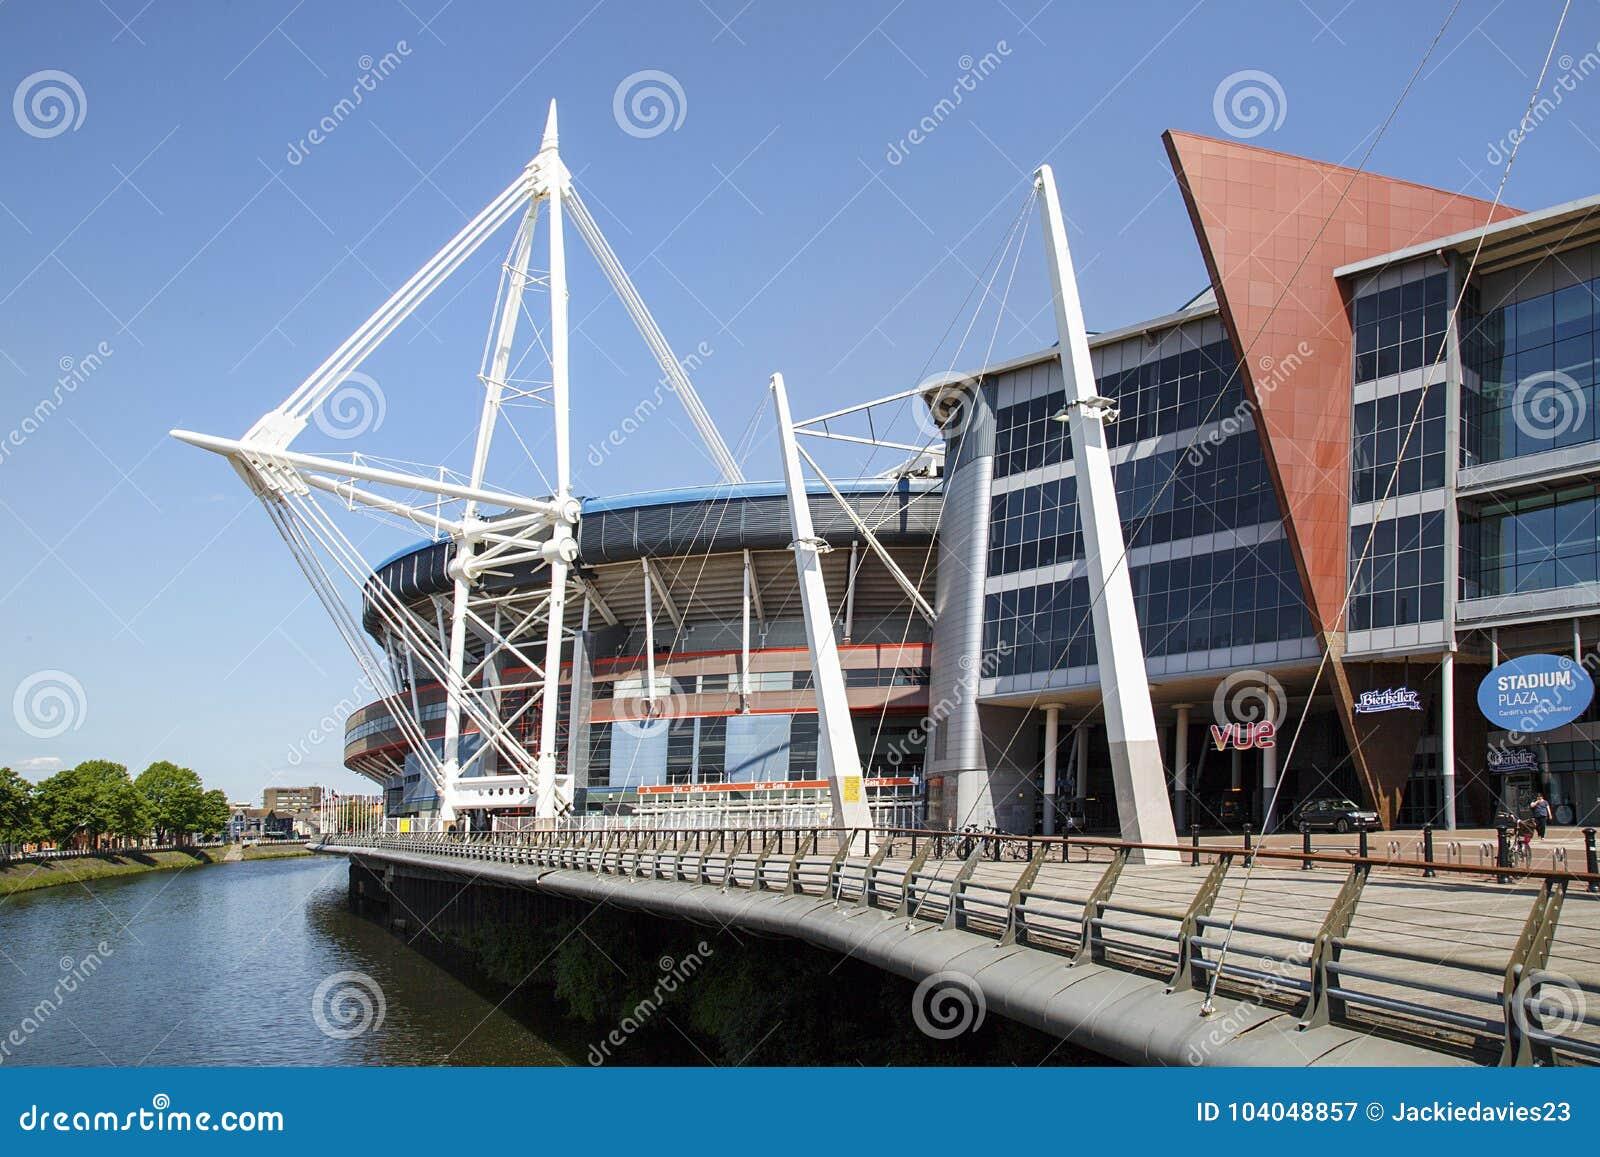 Principality Stadium Cardiff